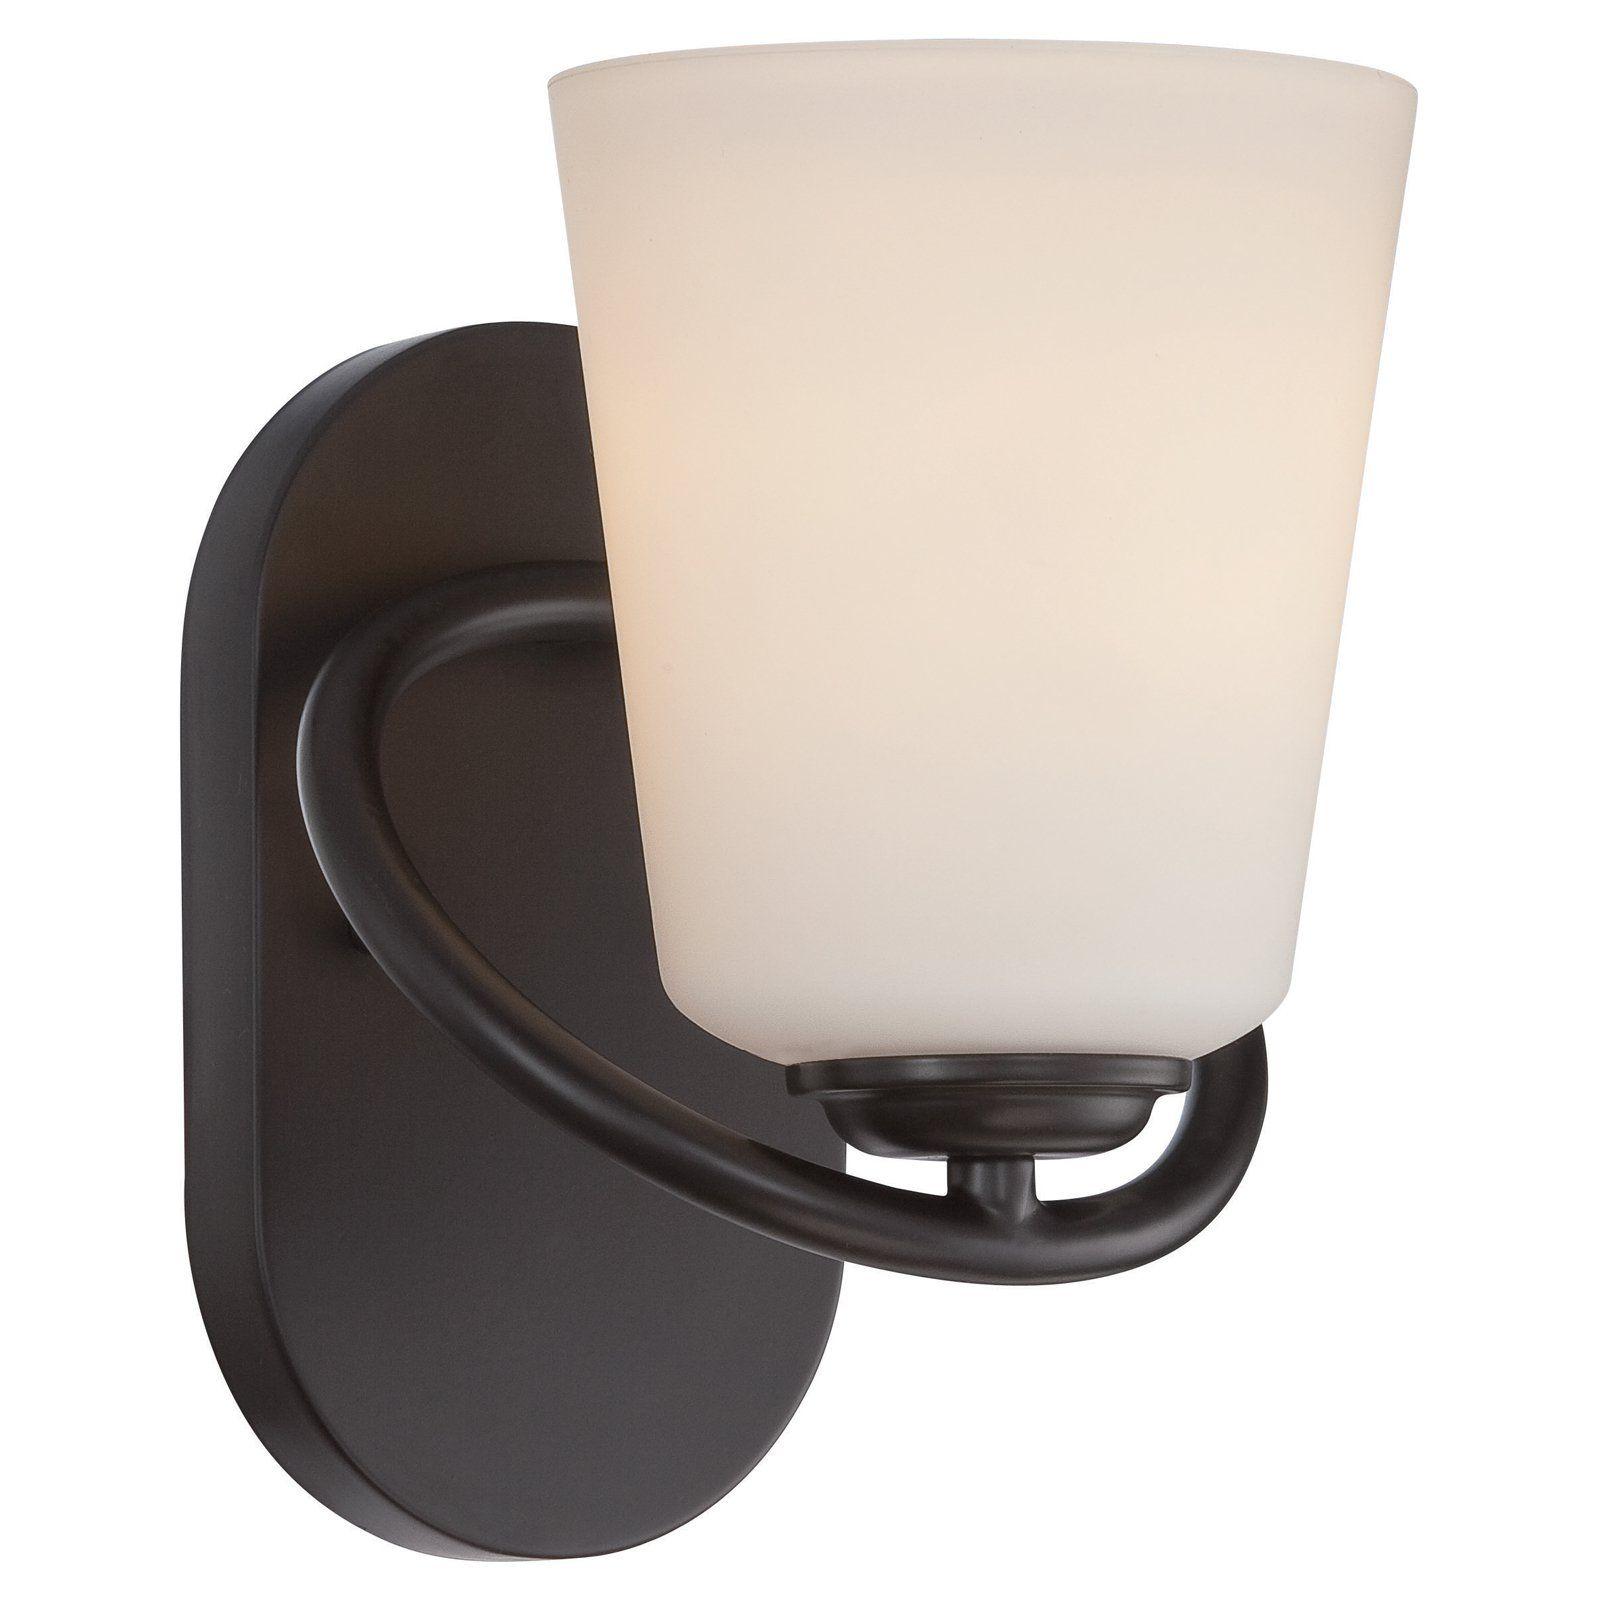 Photo of Nuvo 62/4 Dylan 1 light bathroom Vanity Light Mahogany bronze